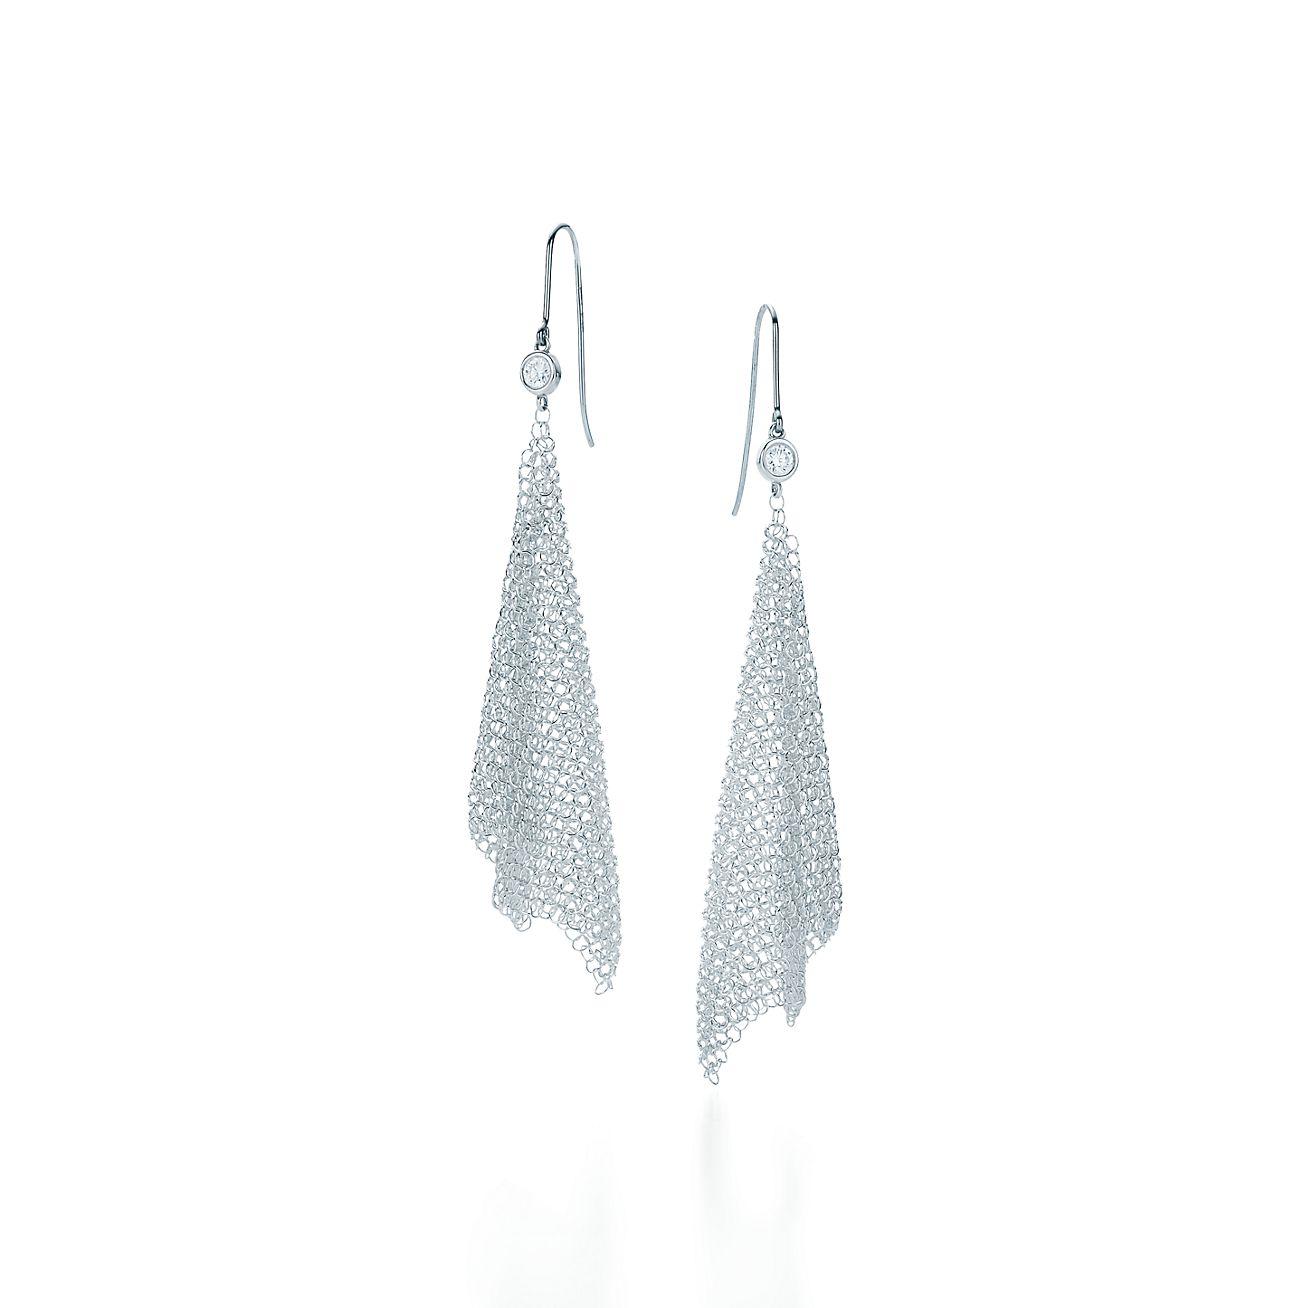 Elsa Peretti Mesh scarf earrings in sterling silver, small Tiffany & Co.